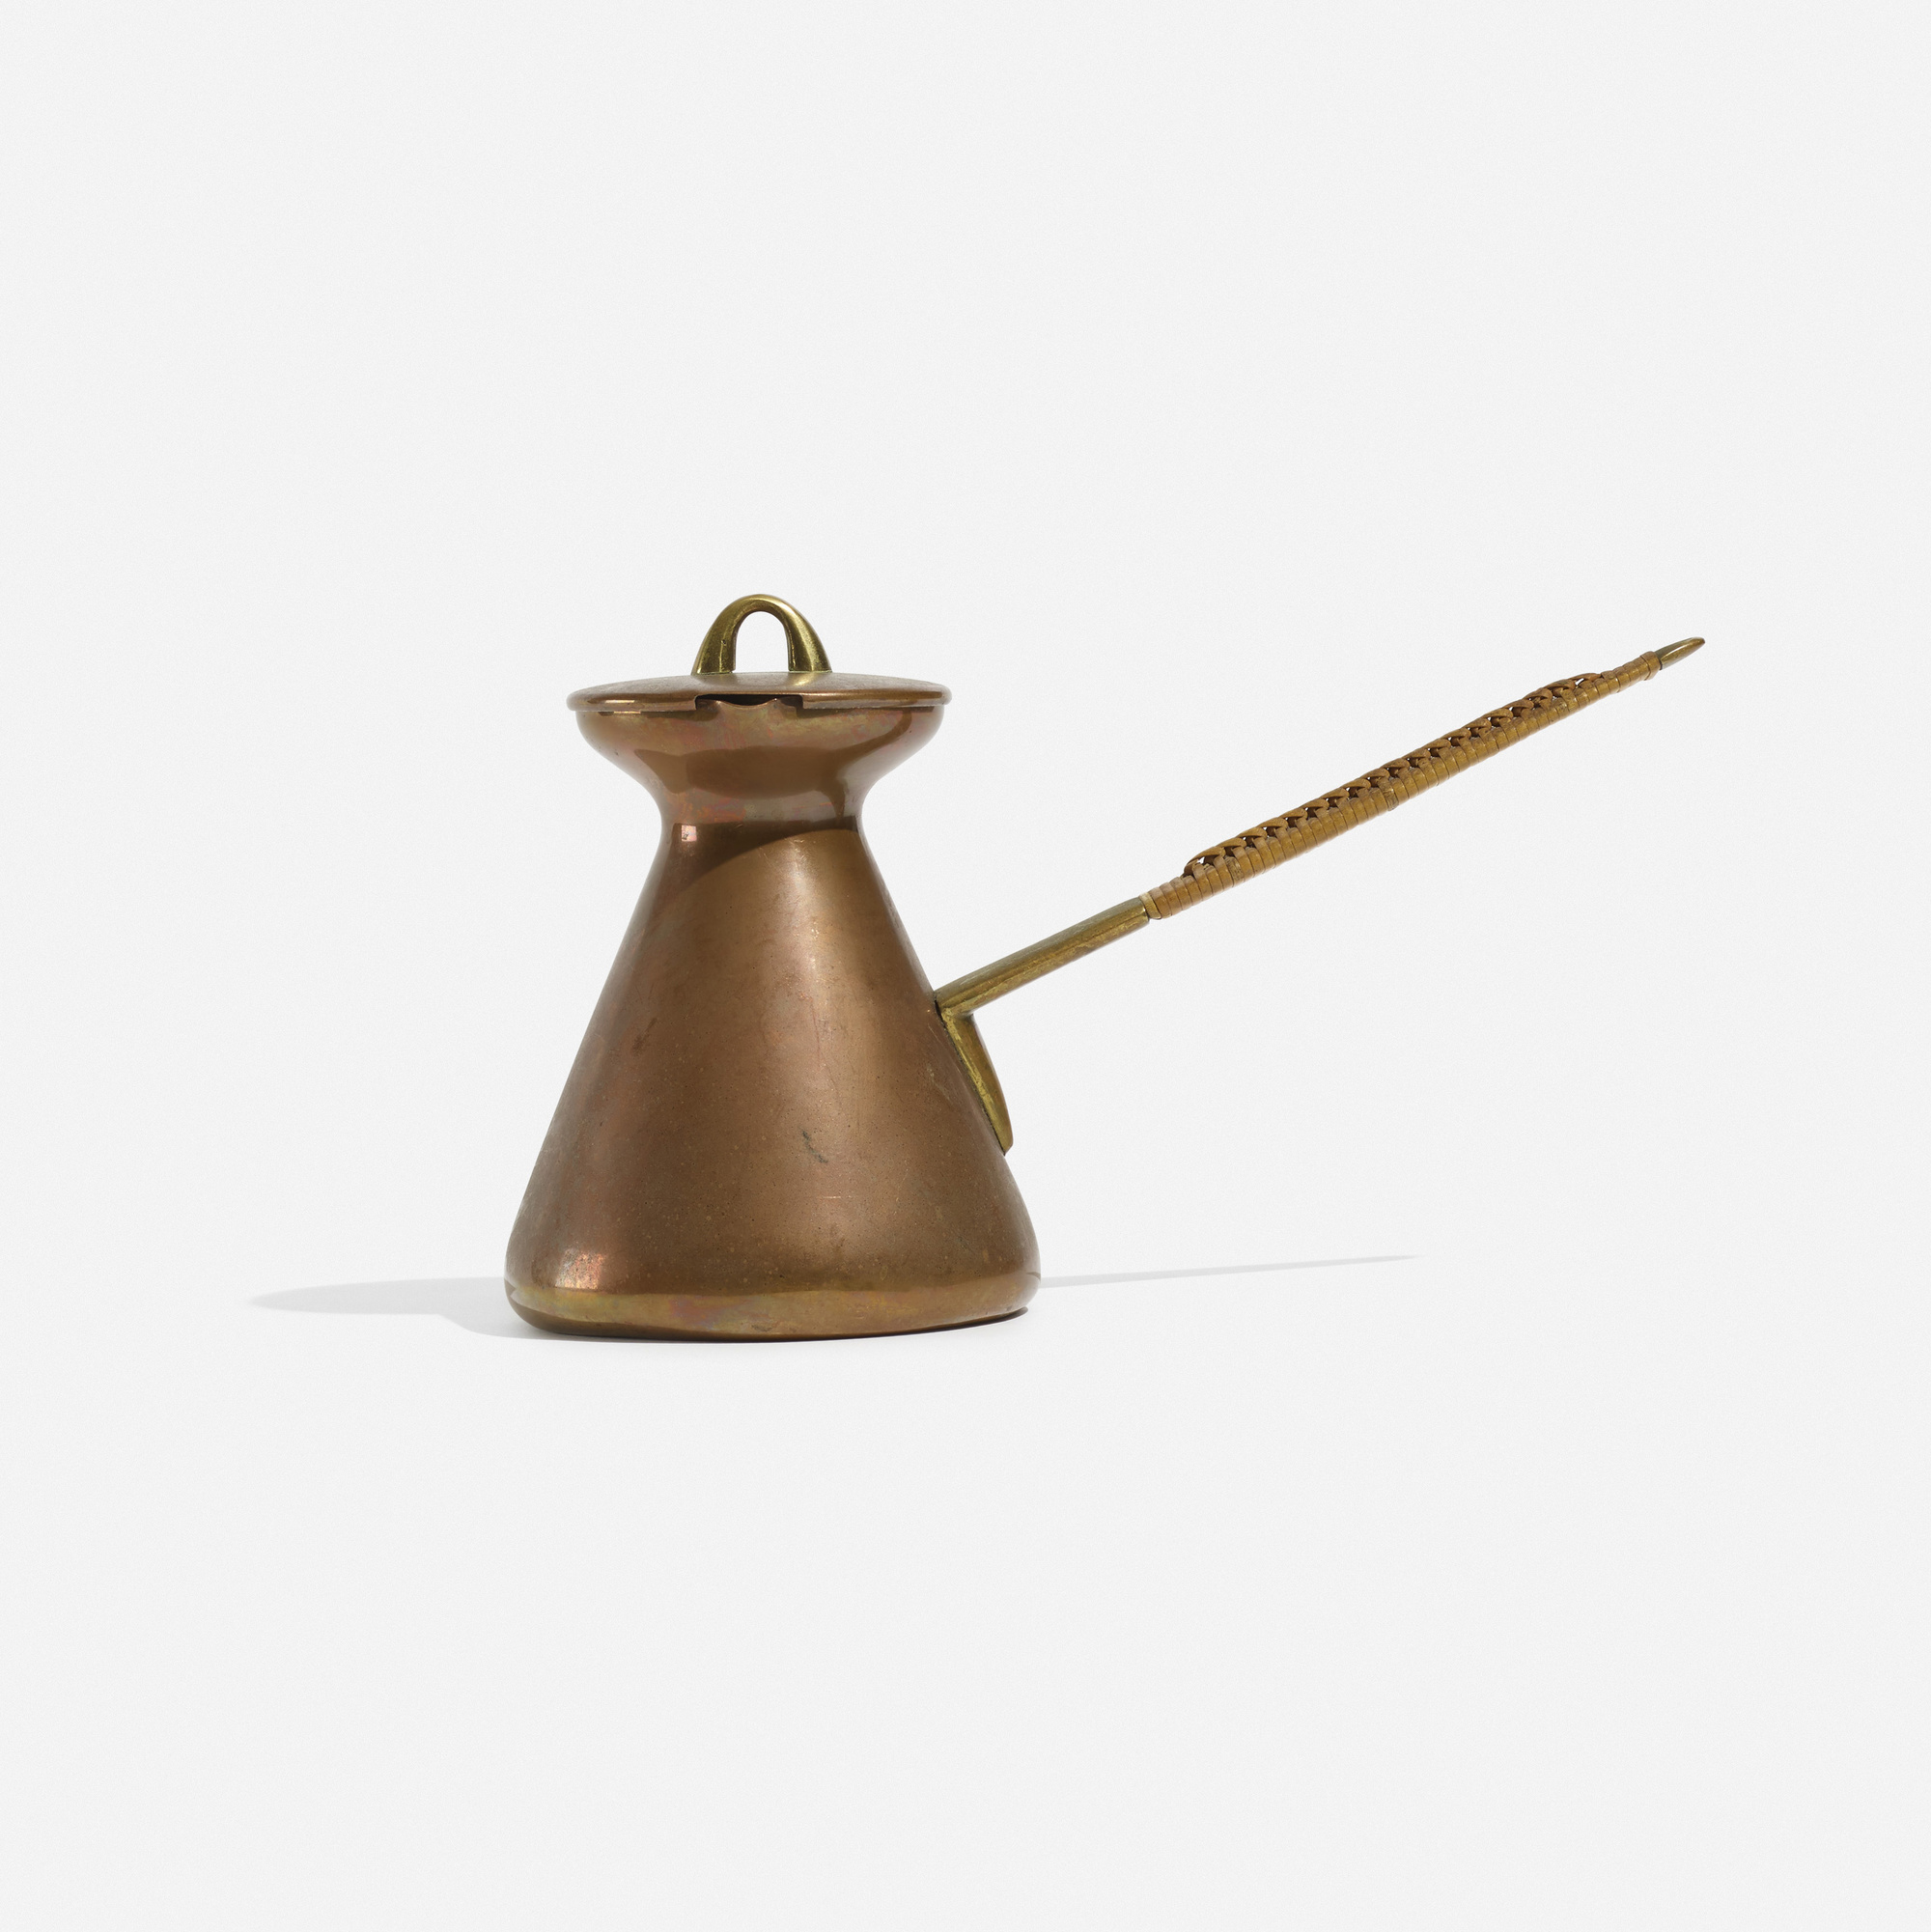 315: Carl Auböck II / hot chocolate pot (1 of 2)